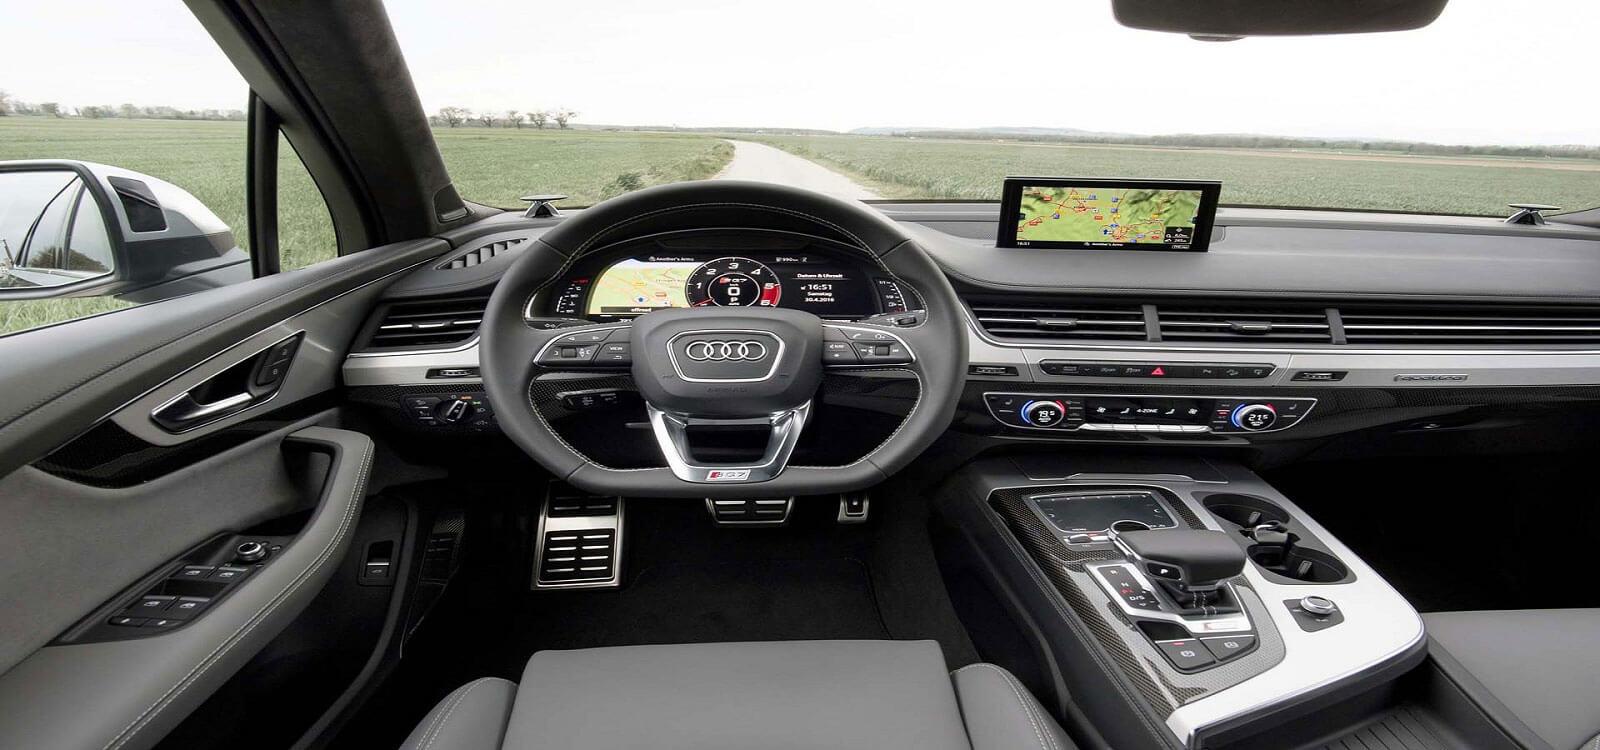 2017 Audi SQ7 LW 15.jpg4